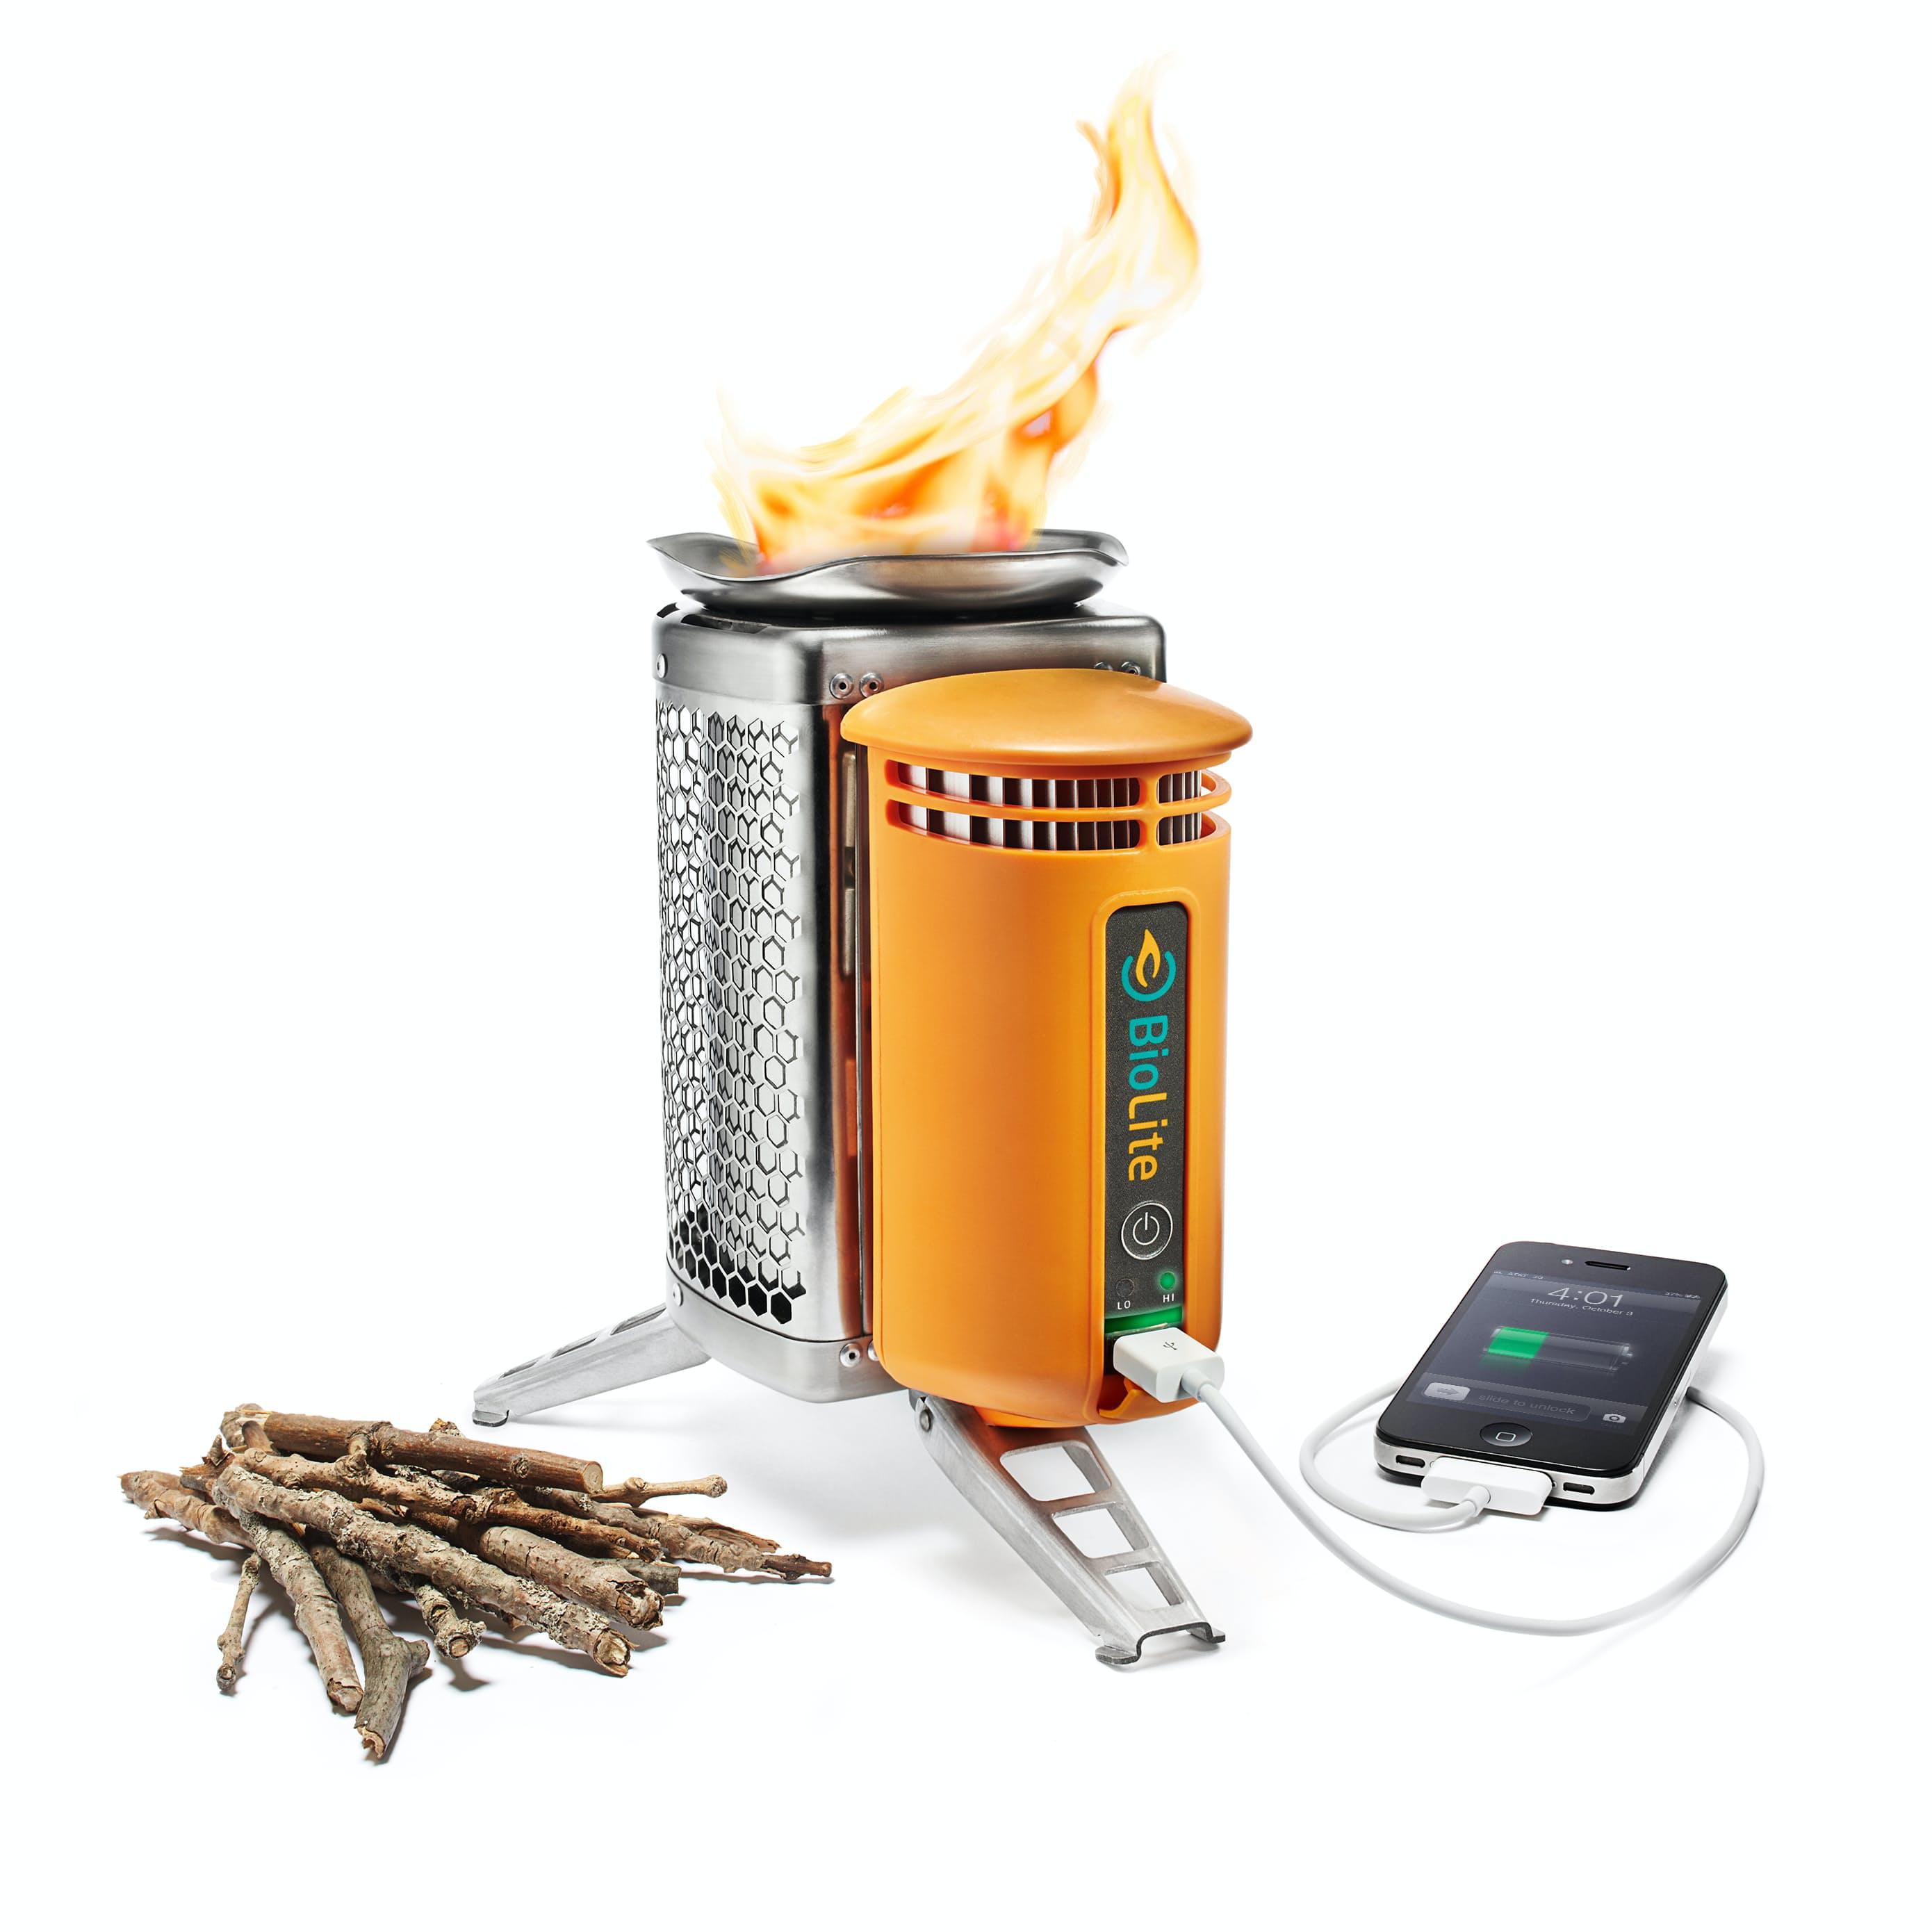 6eadkulbmj biolite camp stove 0 original